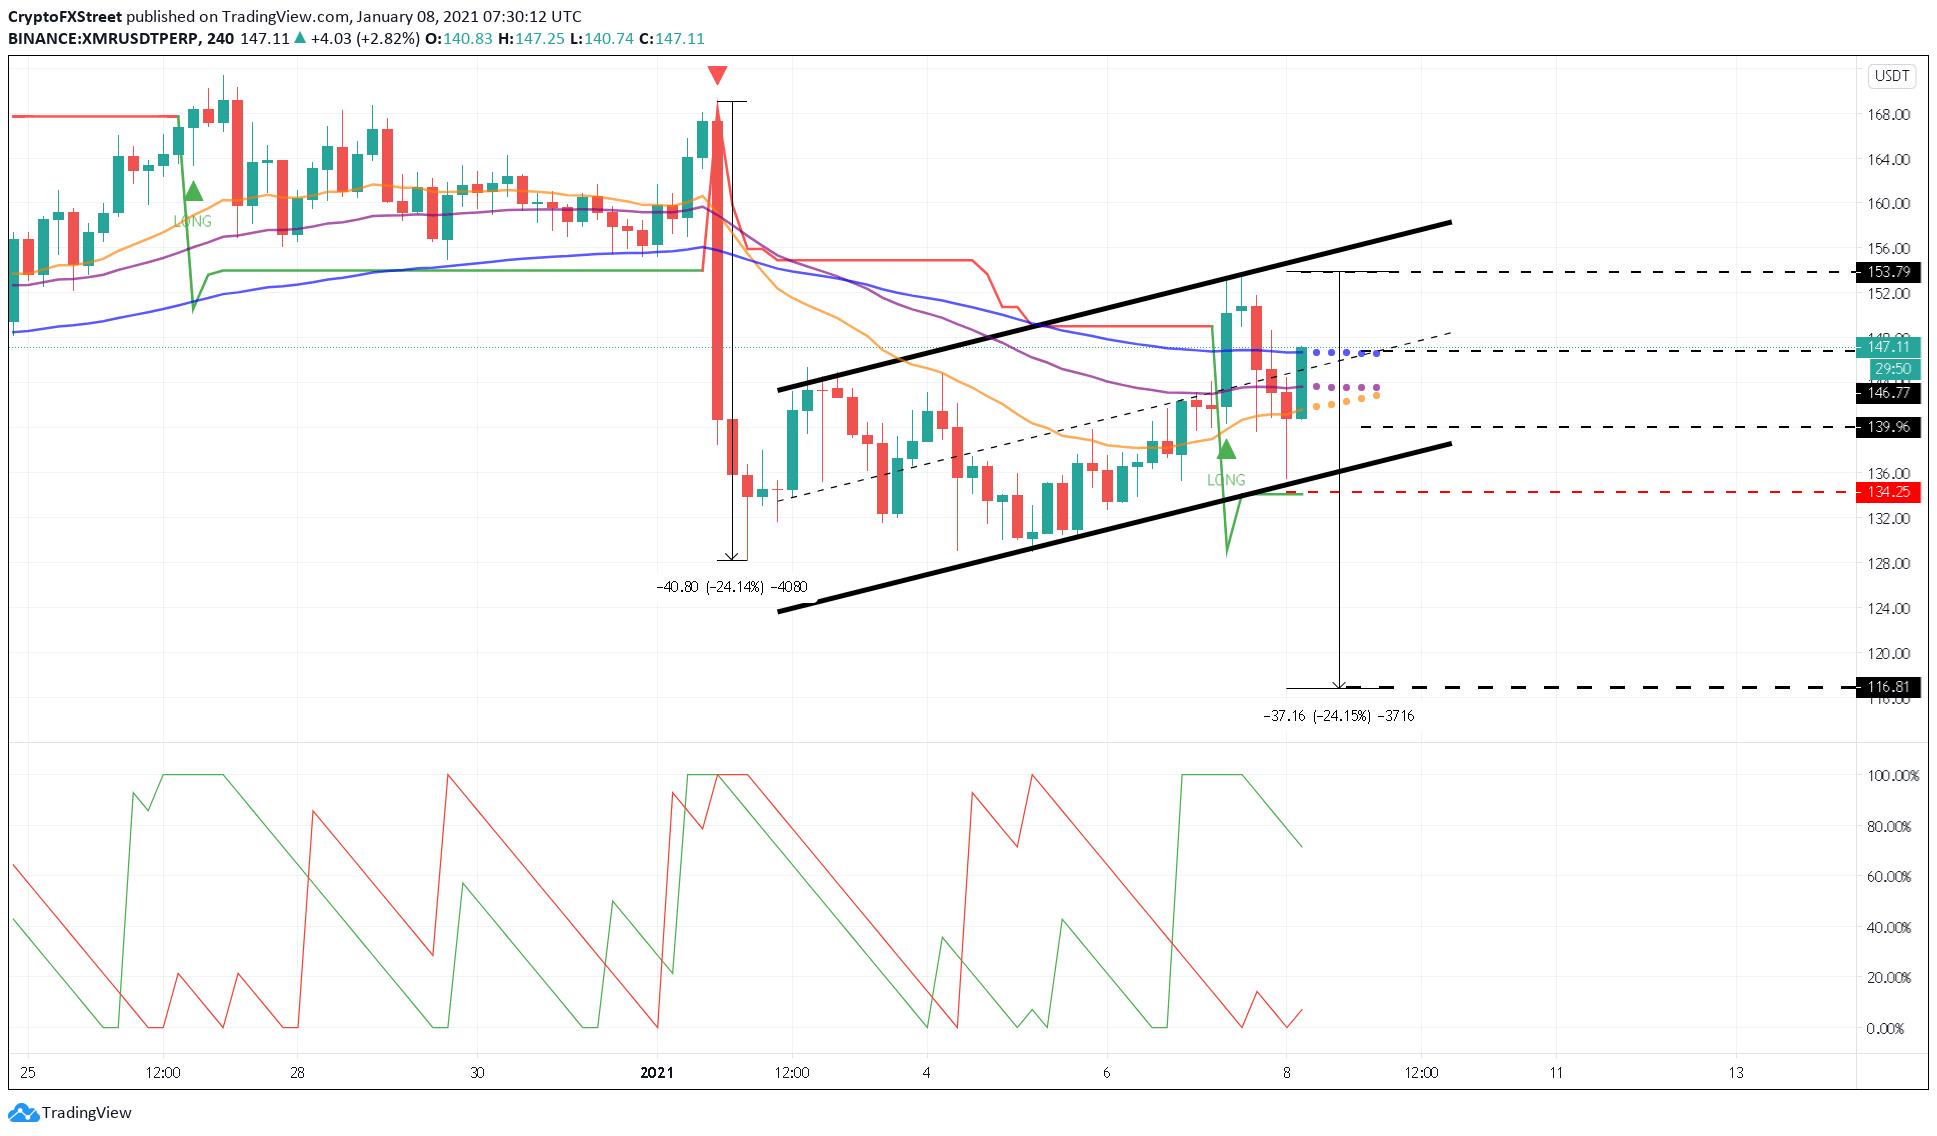 Monero price US dollar chart